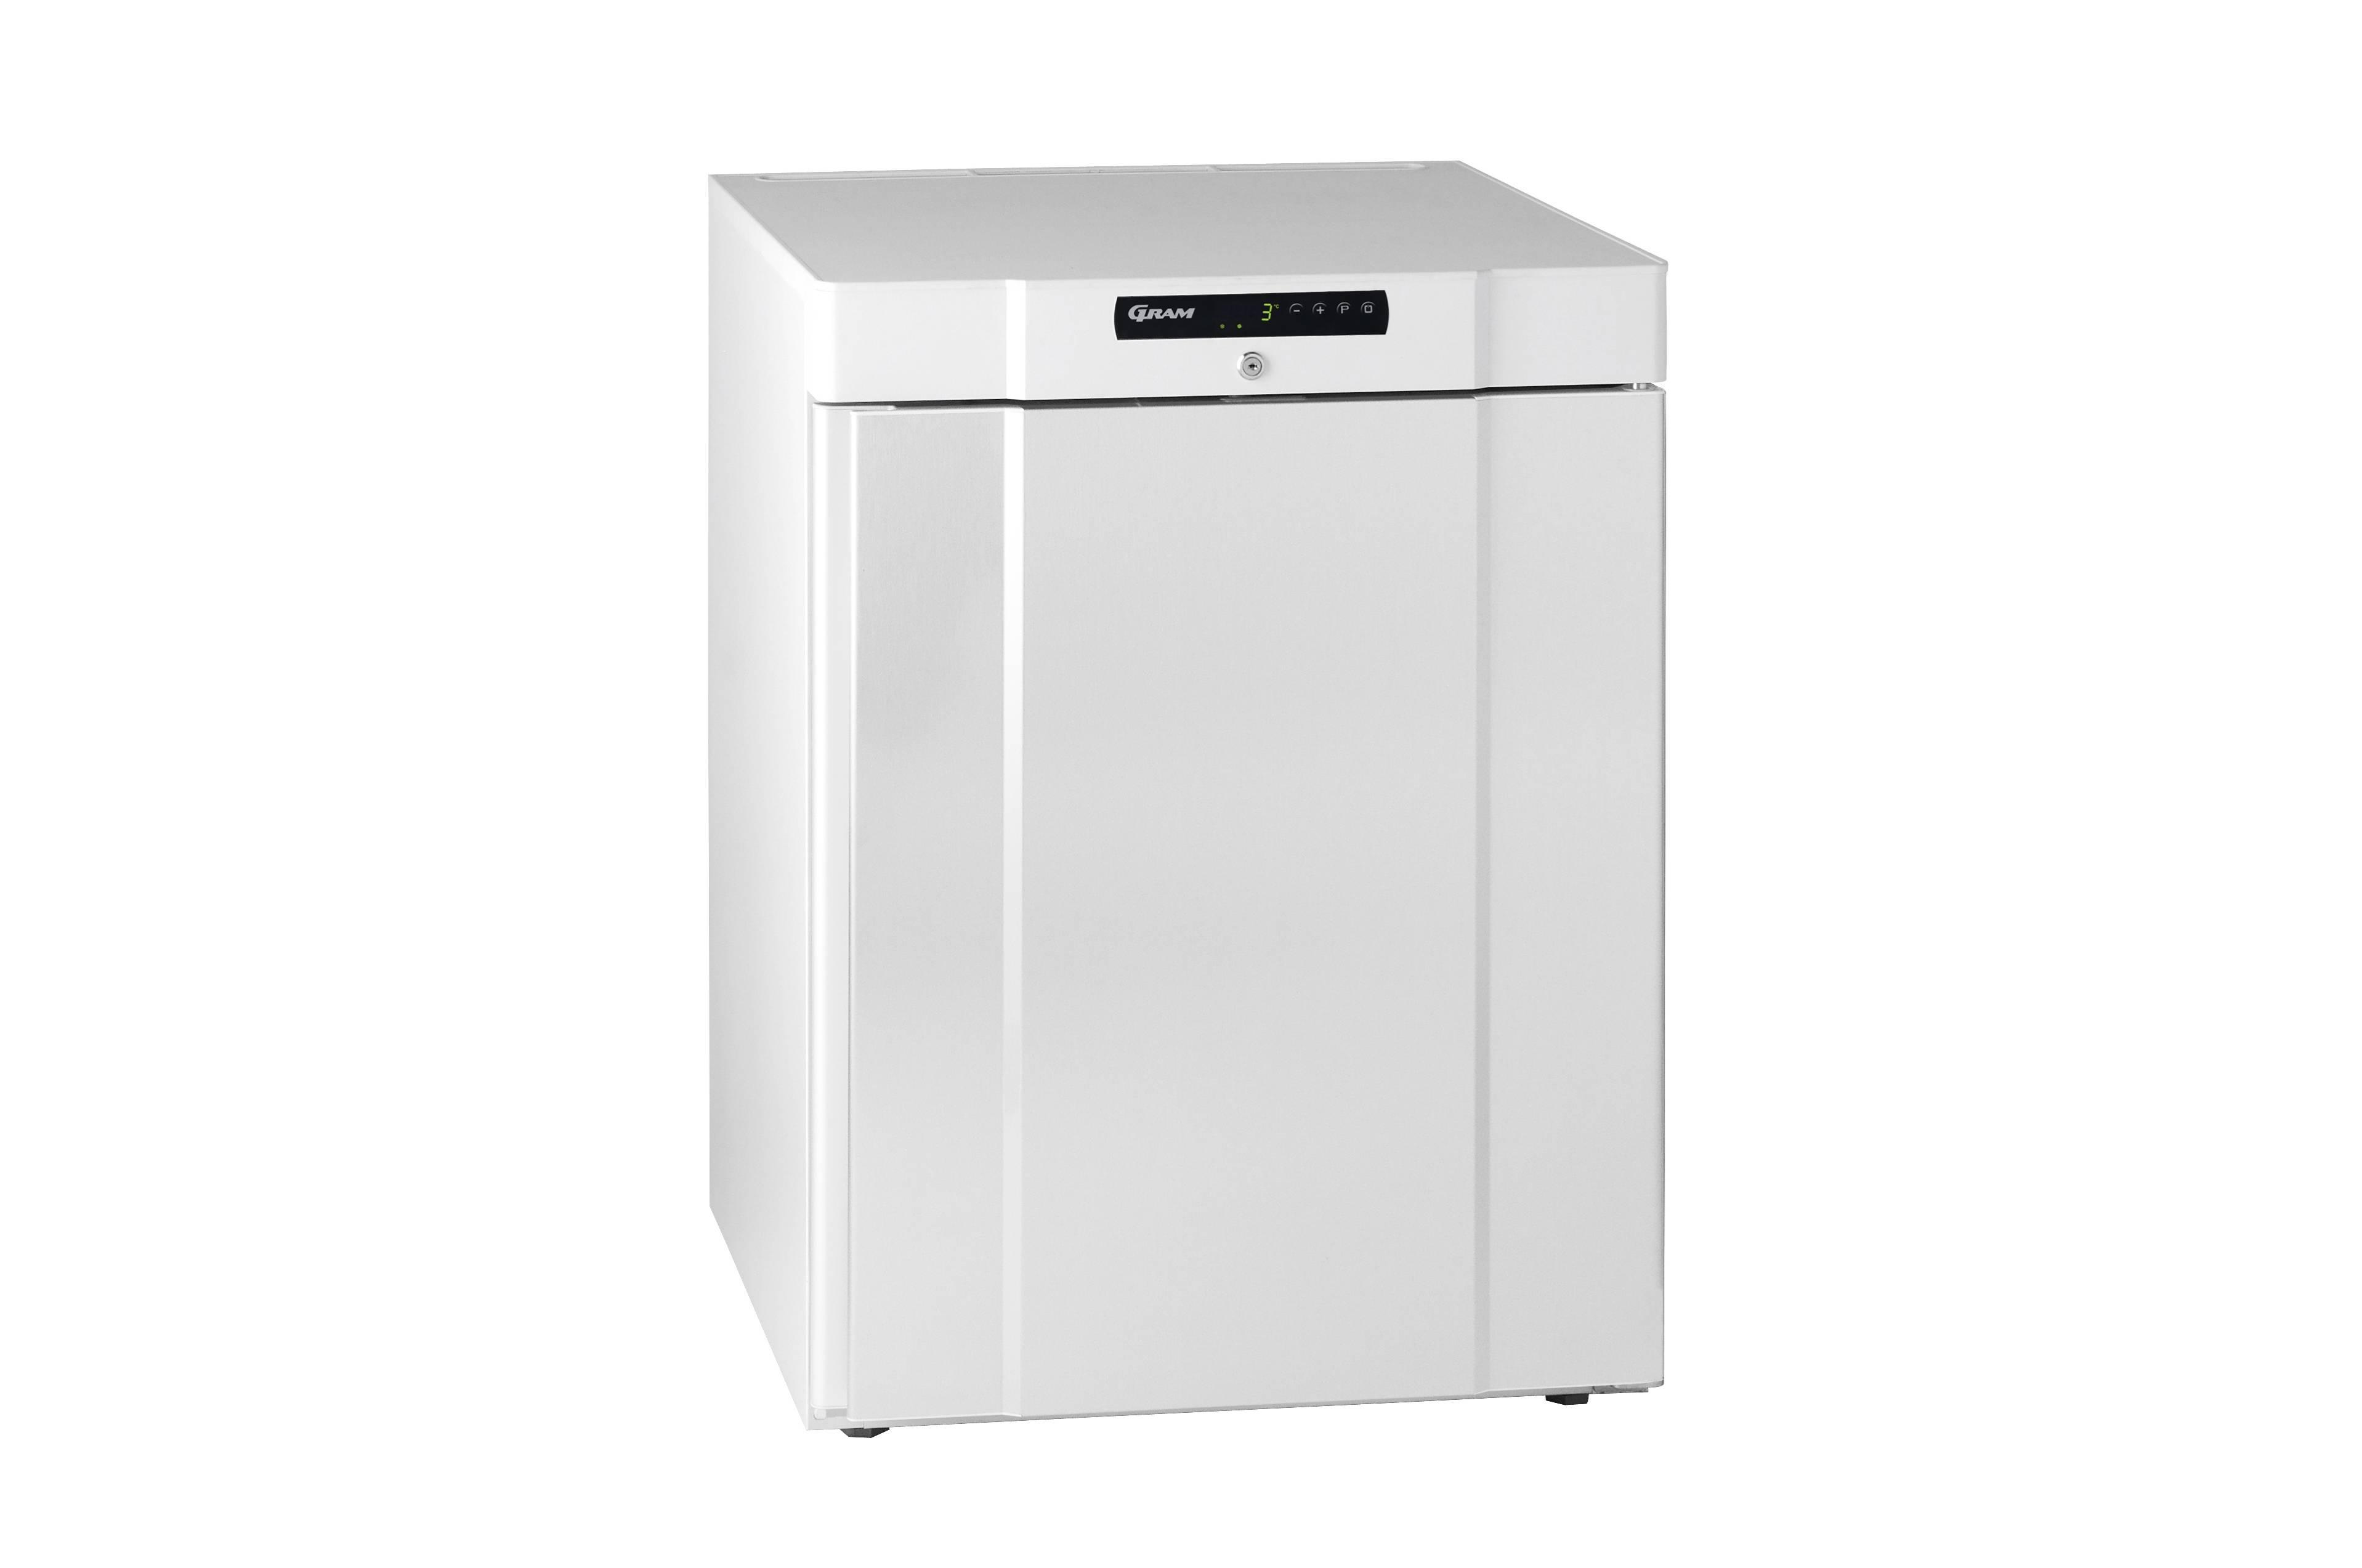 Kühlschrank Lg : Kältetechnik rauschenbach gmbh gram kühlschrank compact k lg